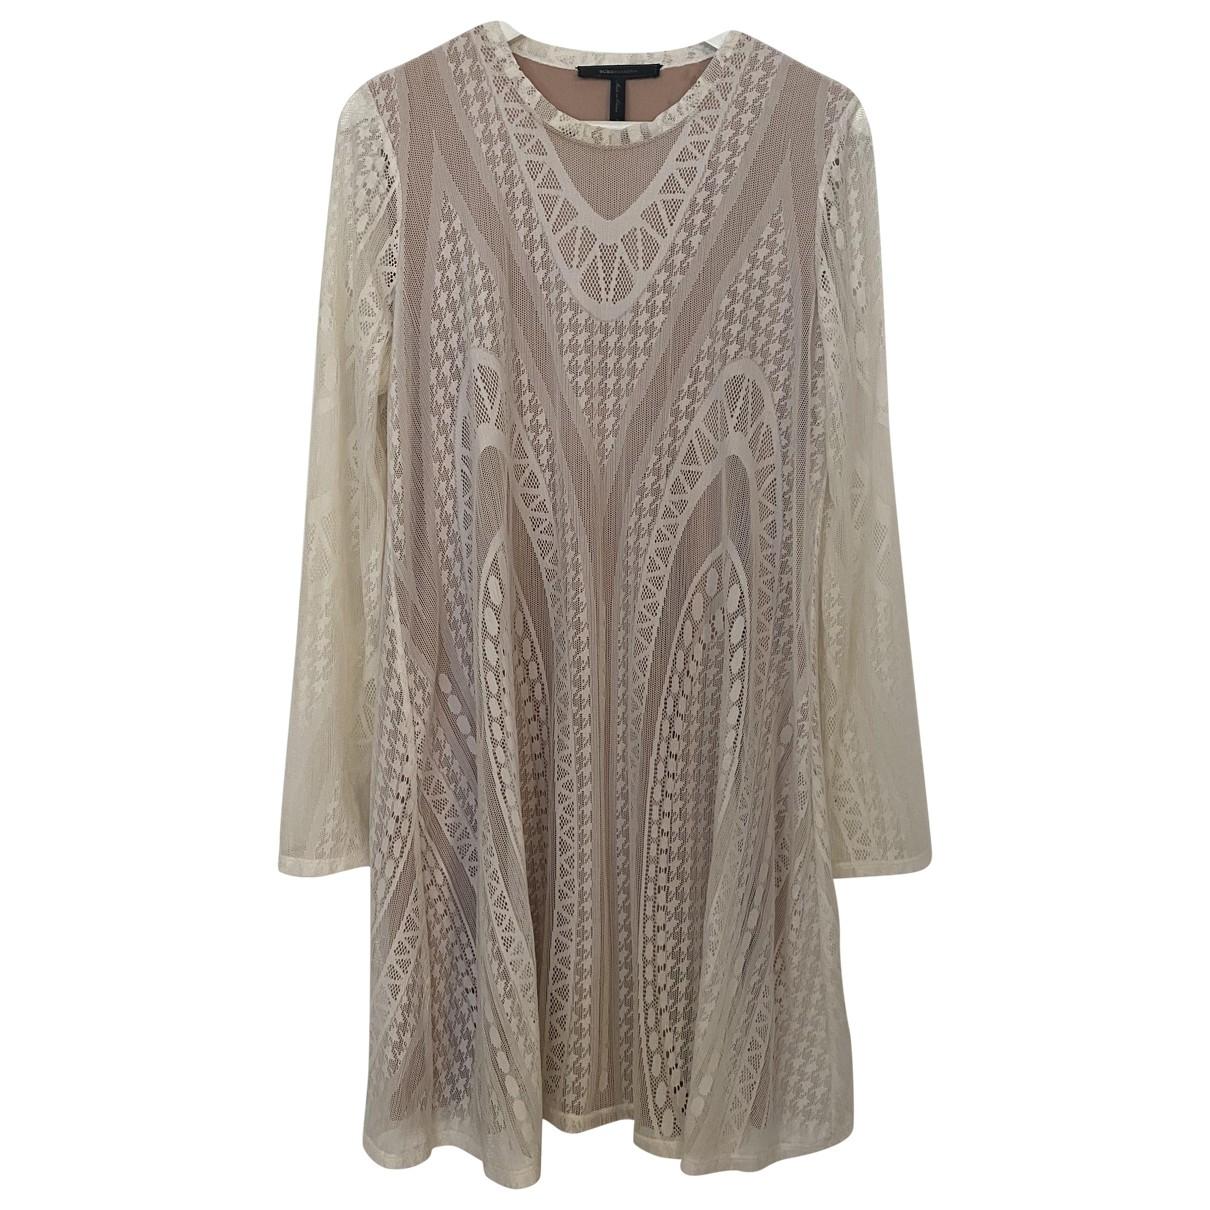 Bcbg Max Azria - Robe   pour femme en dentelle - blanc